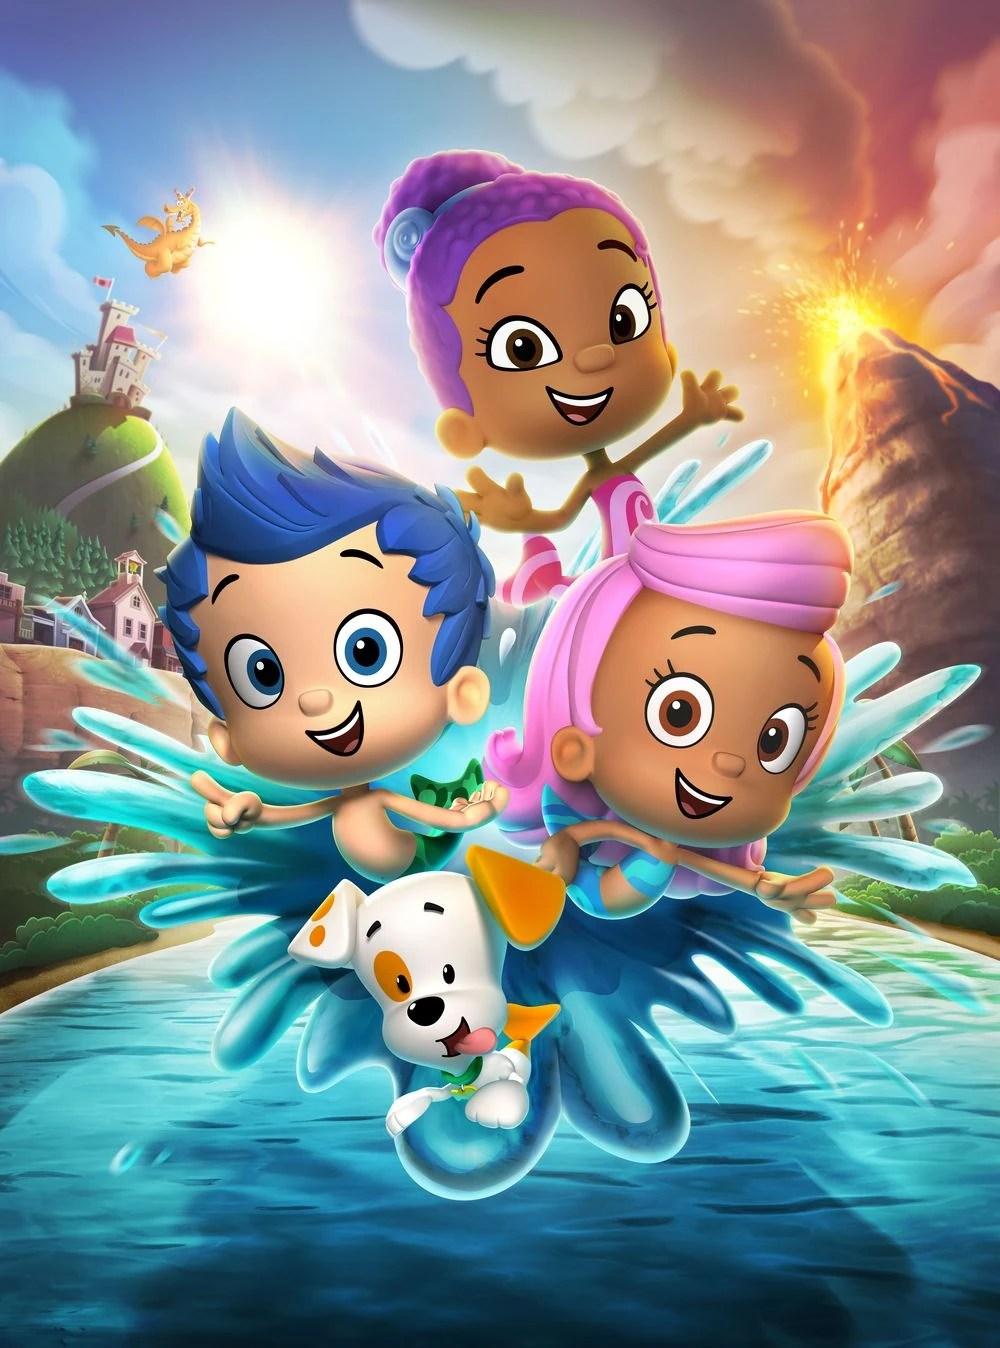 Bubble Guppies Season 4 Episode 10 Bubble Baby : bubble, guppies, season, episode, Season, Bubble, Guppies, Fandom